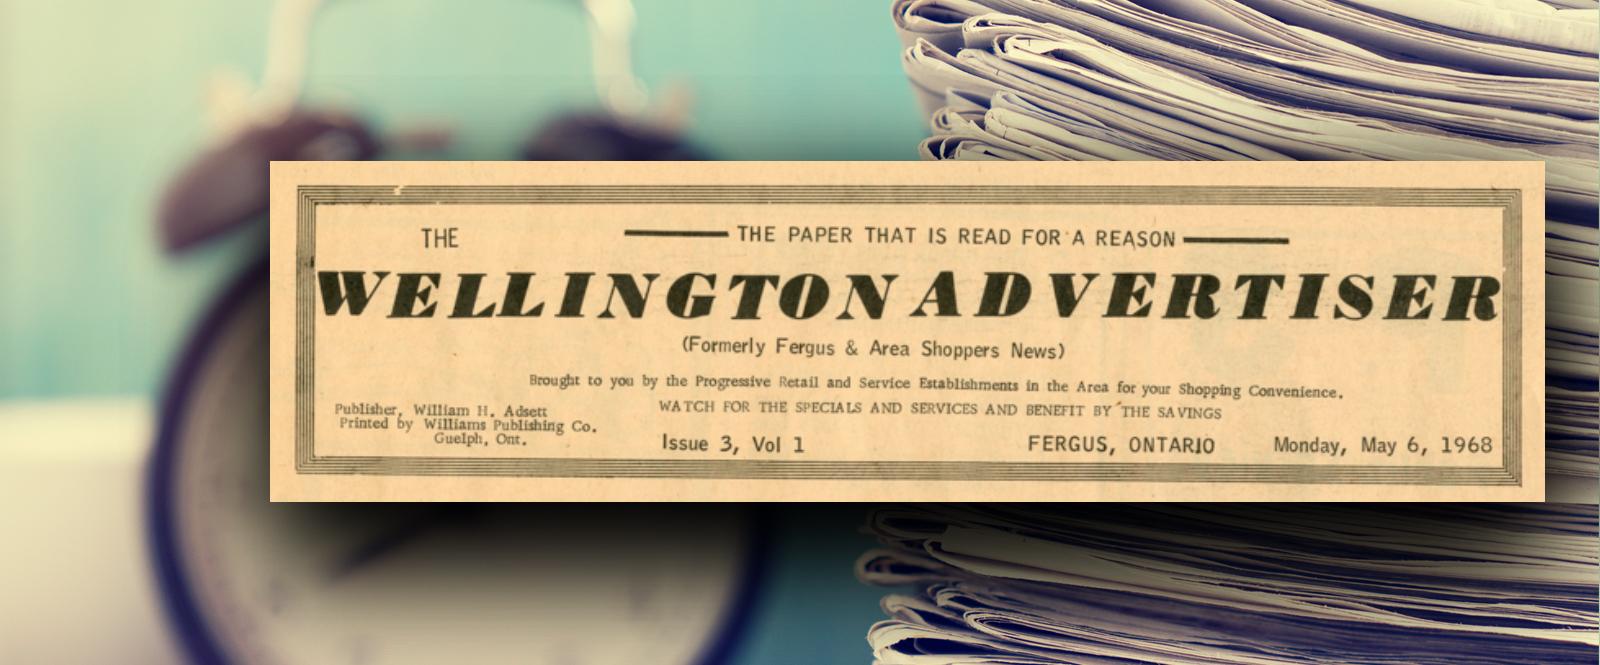 Old Wellington Advertiser newspaper header